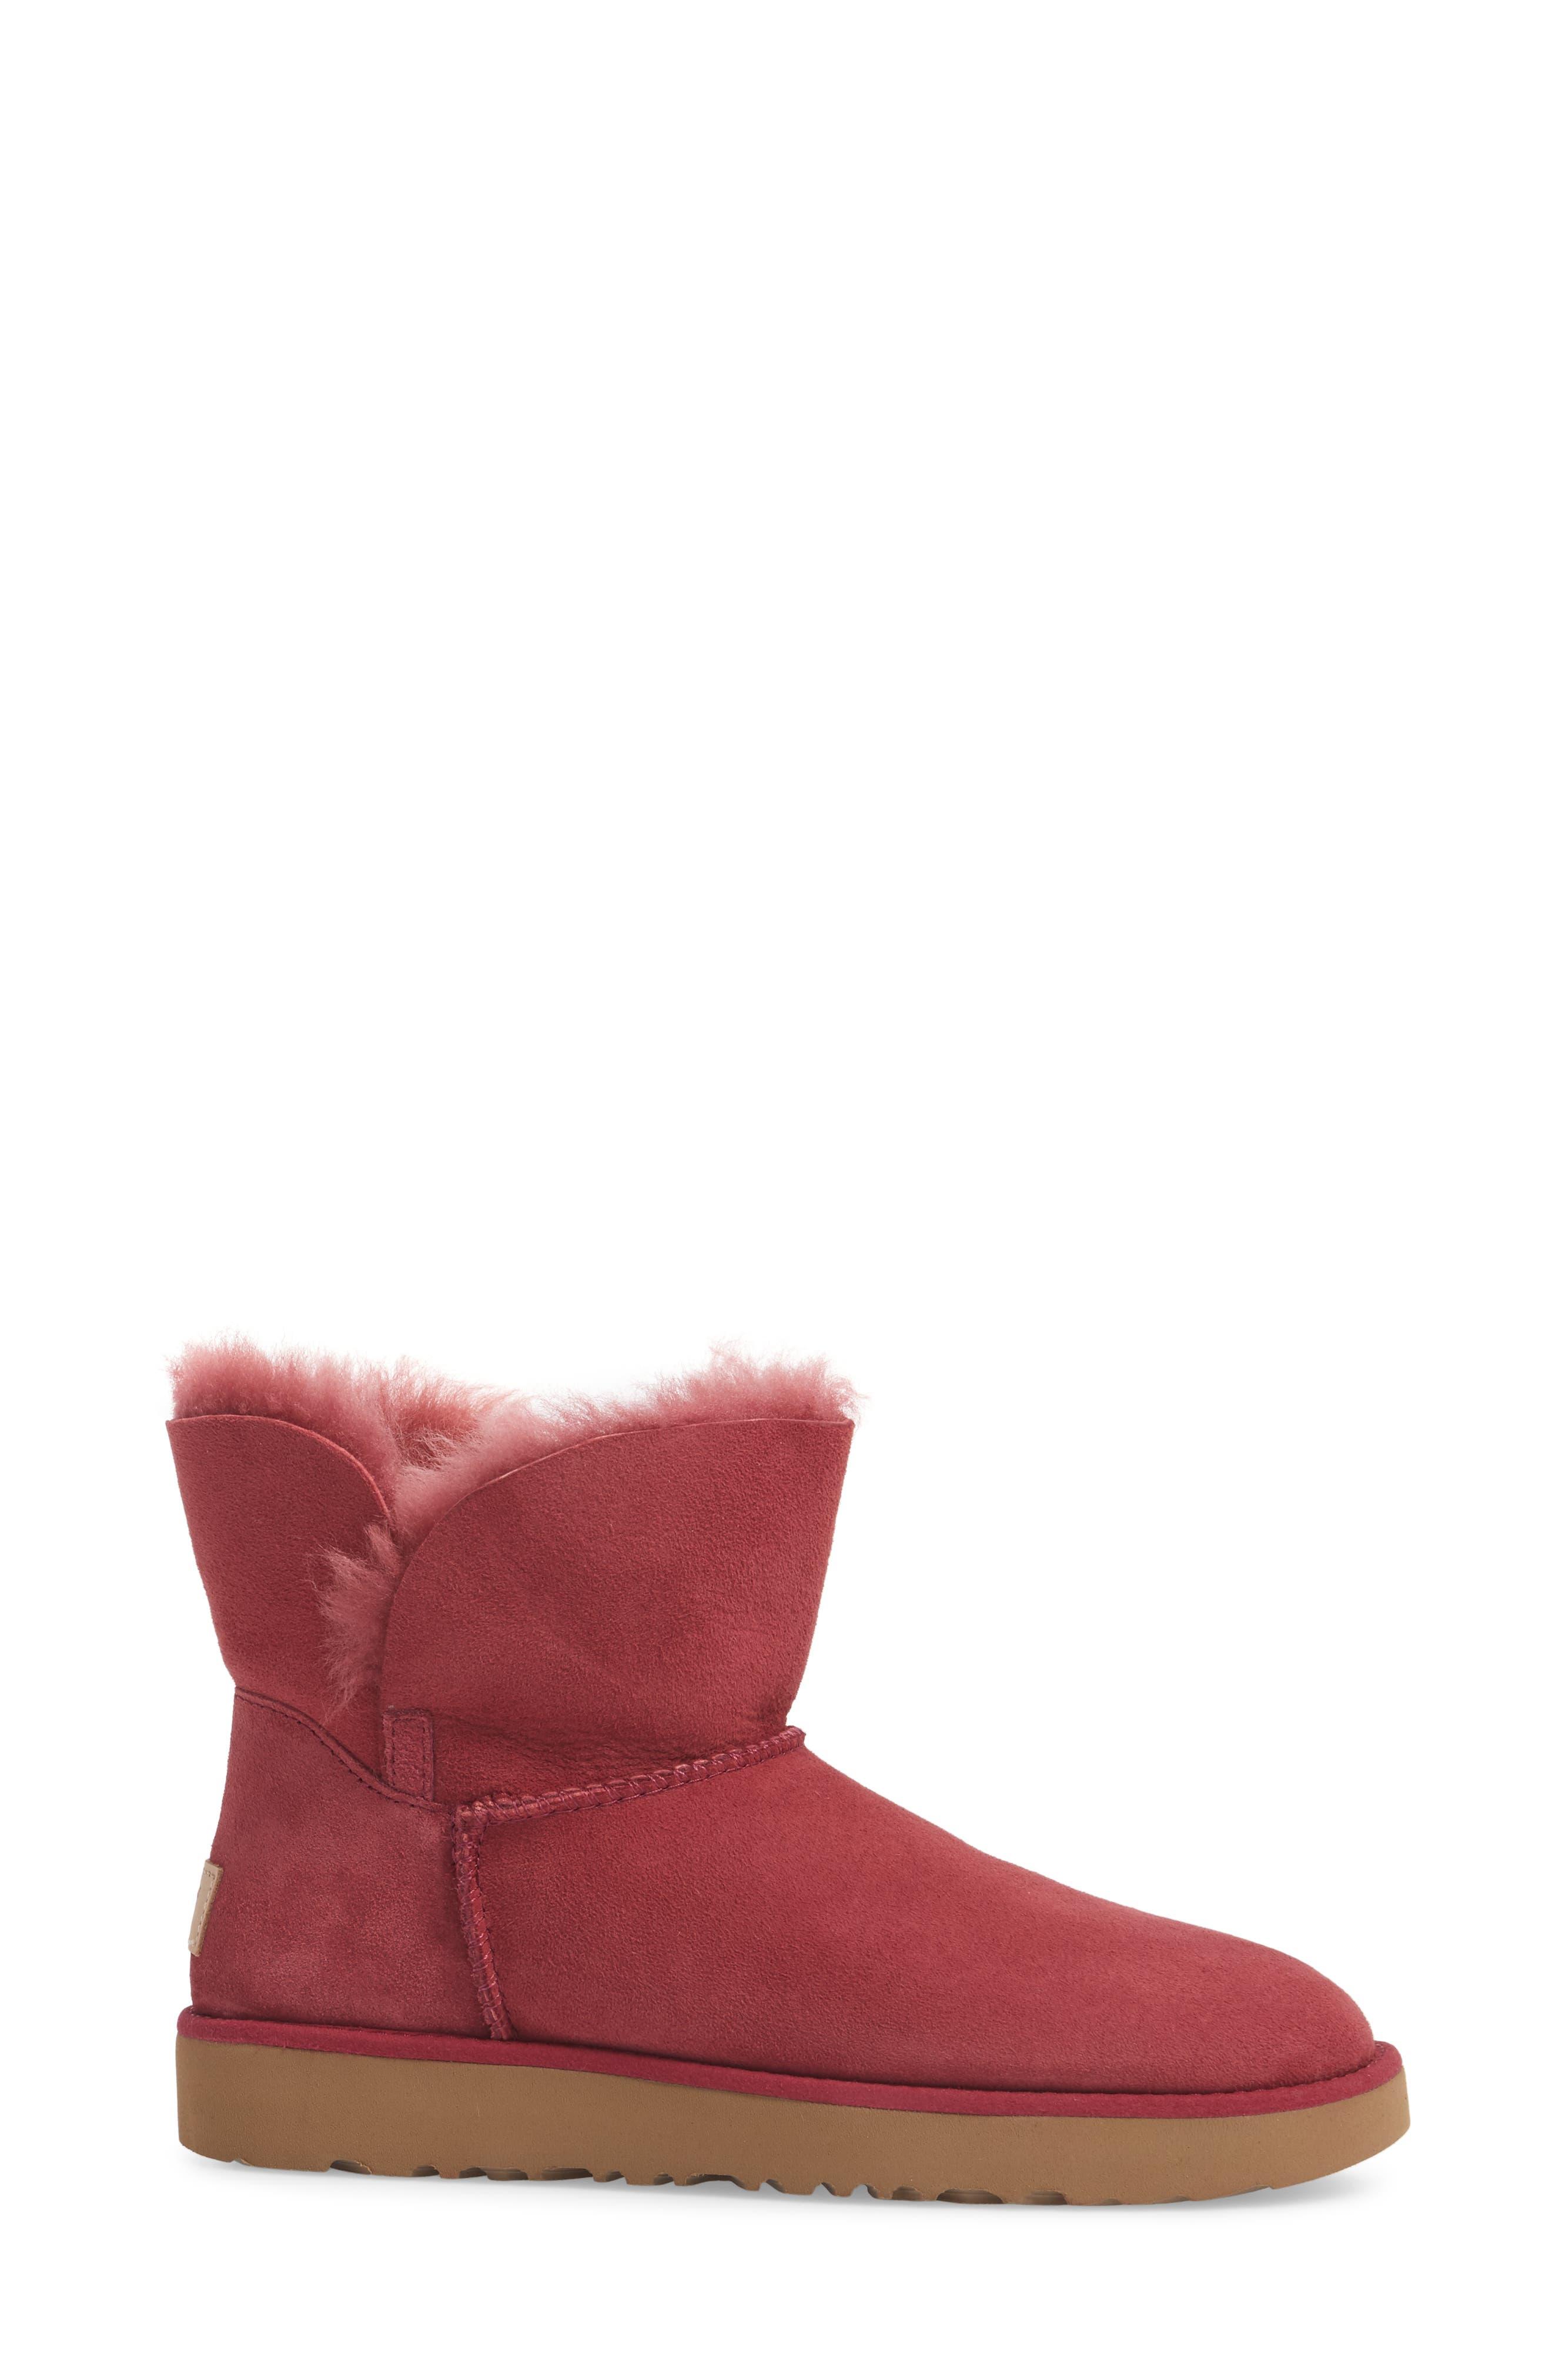 Classic Cuff Mini Boot,                             Alternate thumbnail 3, color,                             Garnet Suede